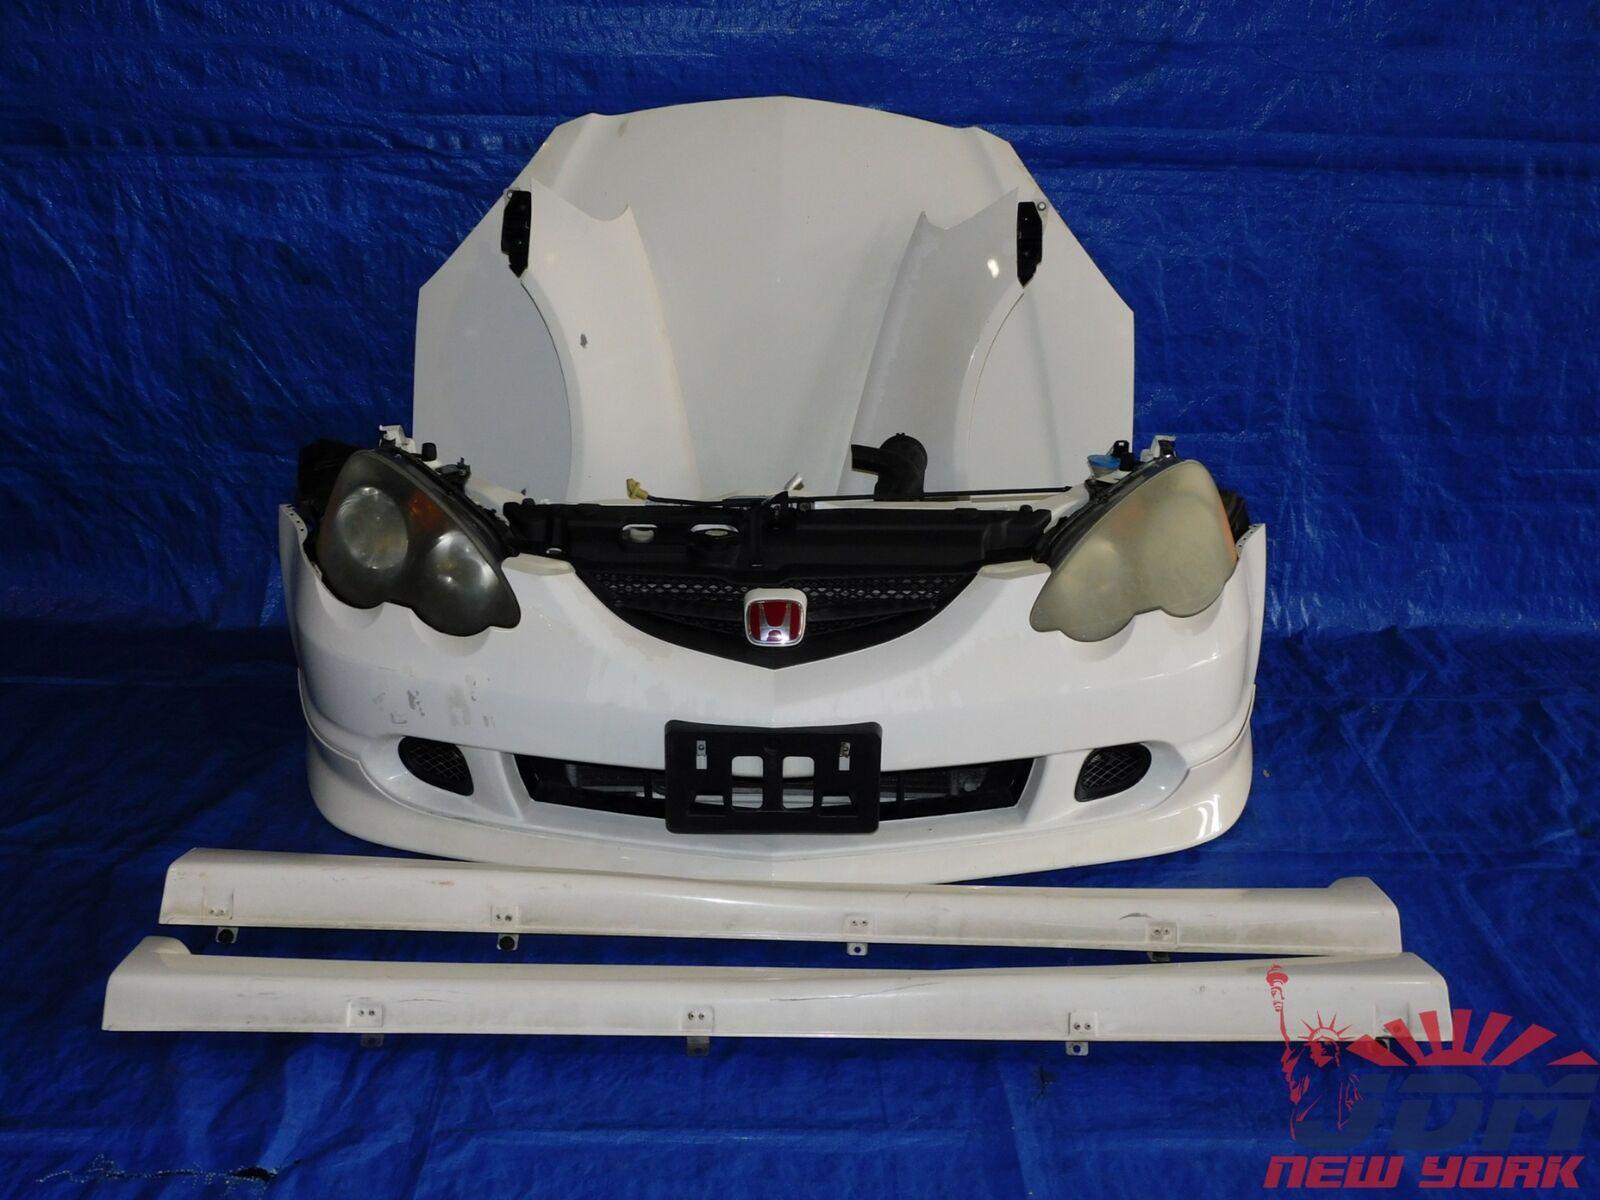 02 06 Jdm Honda Integra Acura Rsx Dc5 Oem Nose Cut Front End Conversion 3 Jdm New York